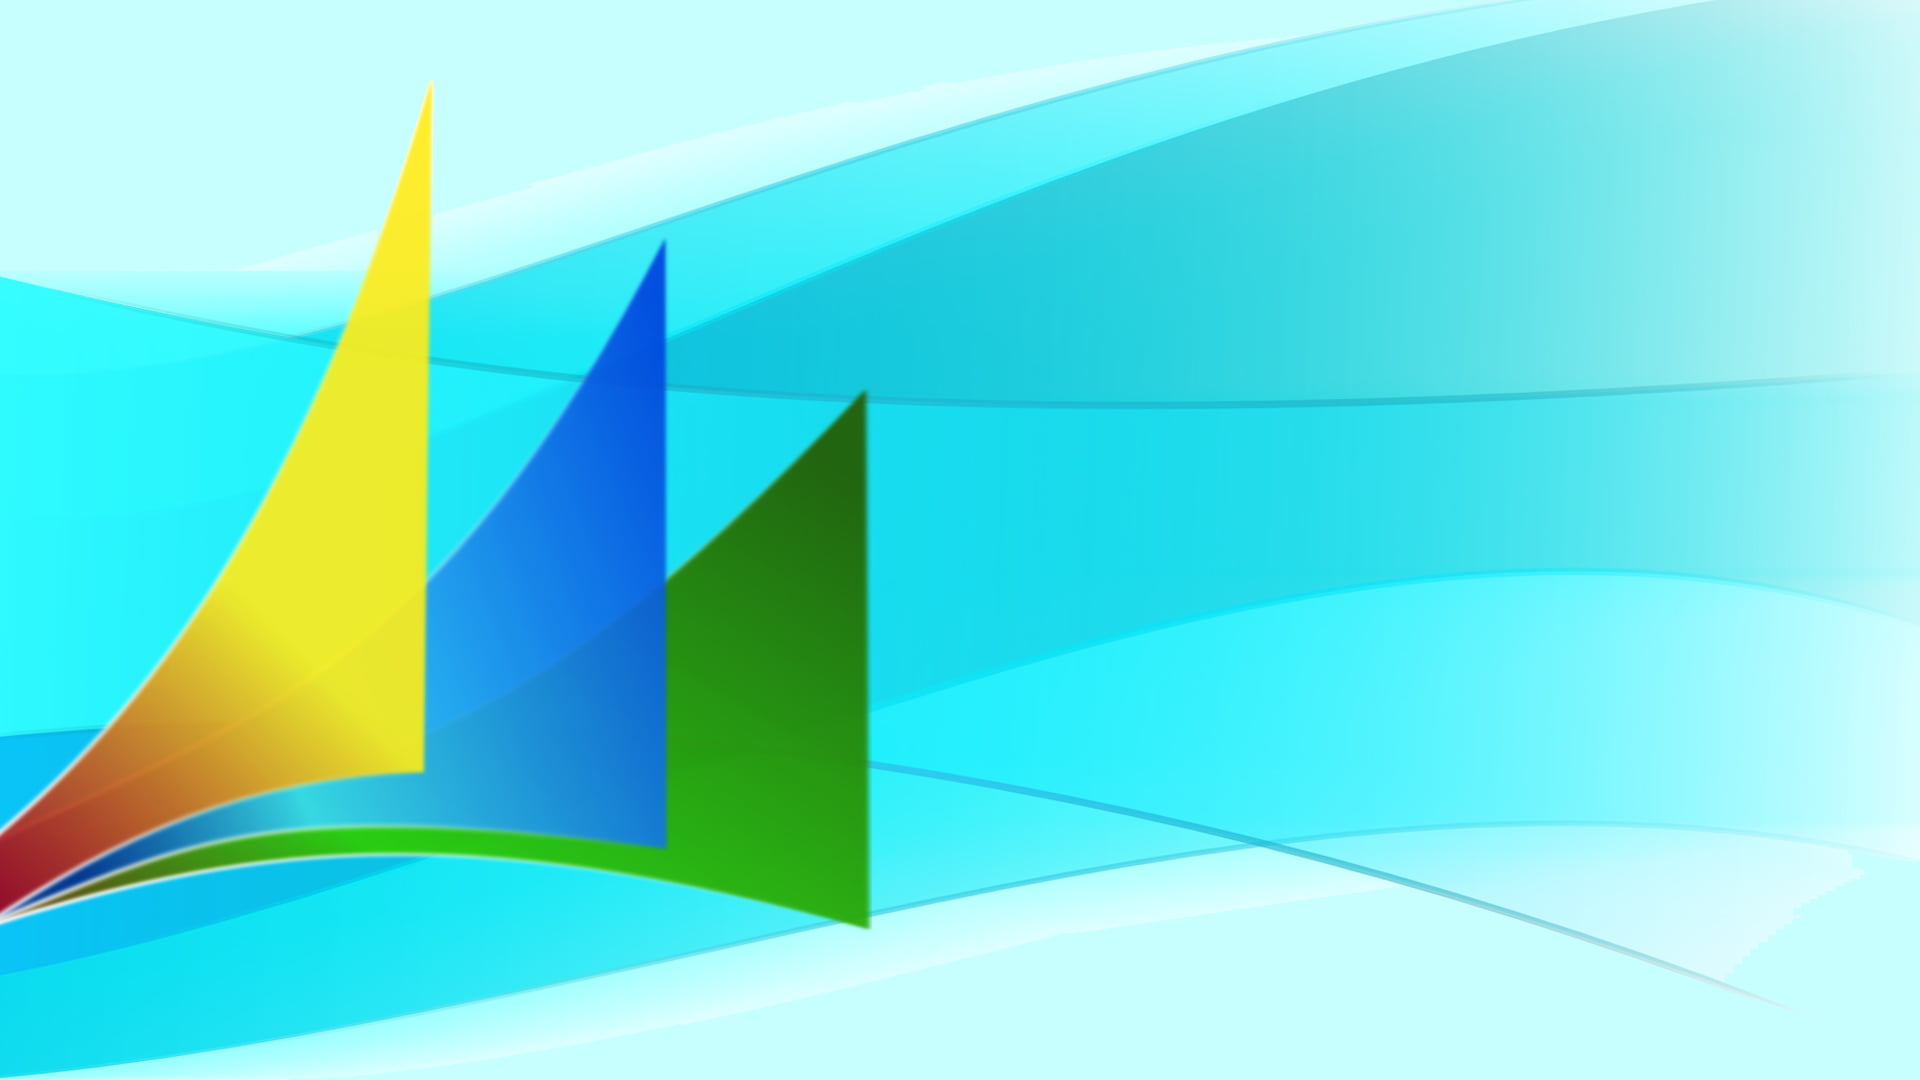 Logo de Dynamics sobre fondo azul